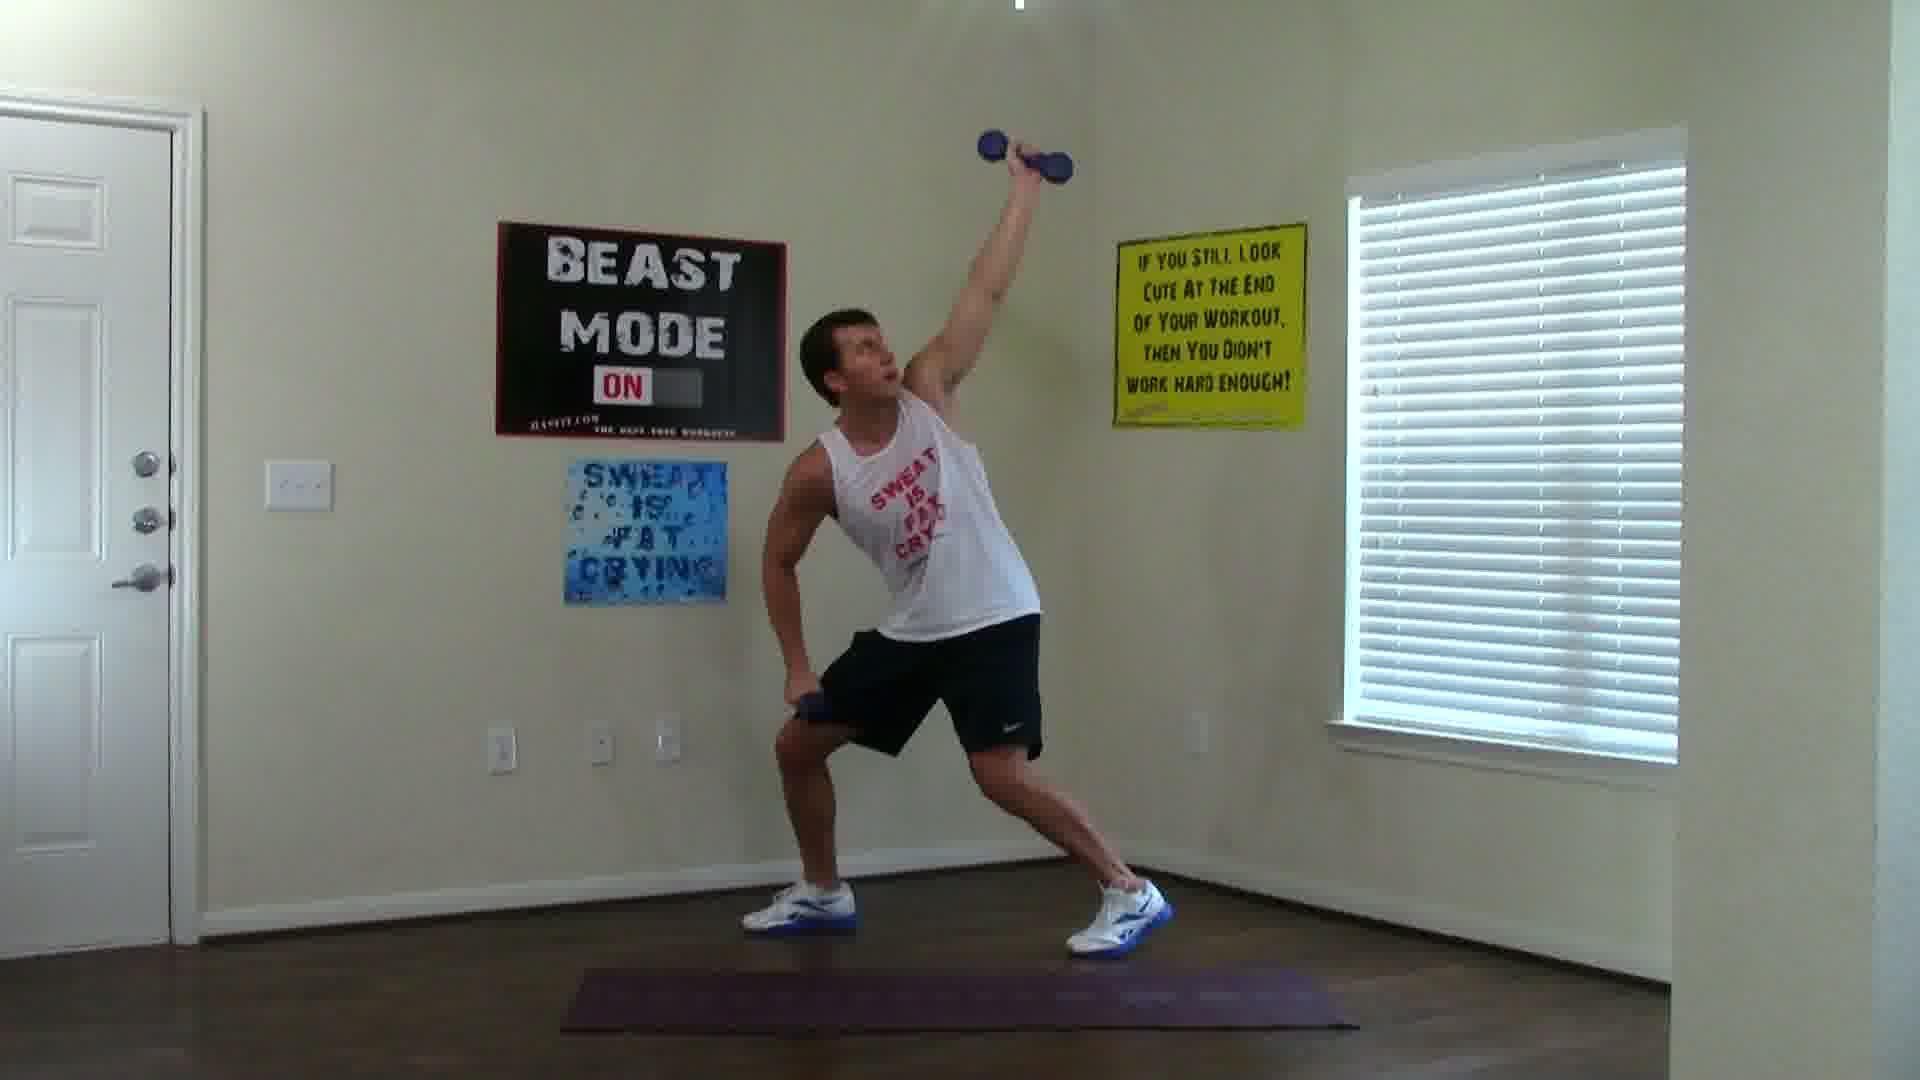 30 Minute Afterburn Workout After Burn Training After Burning Exercises Afterburn Exercise Workouts Biceps Workout Back And Bicep Workout Back And Biceps